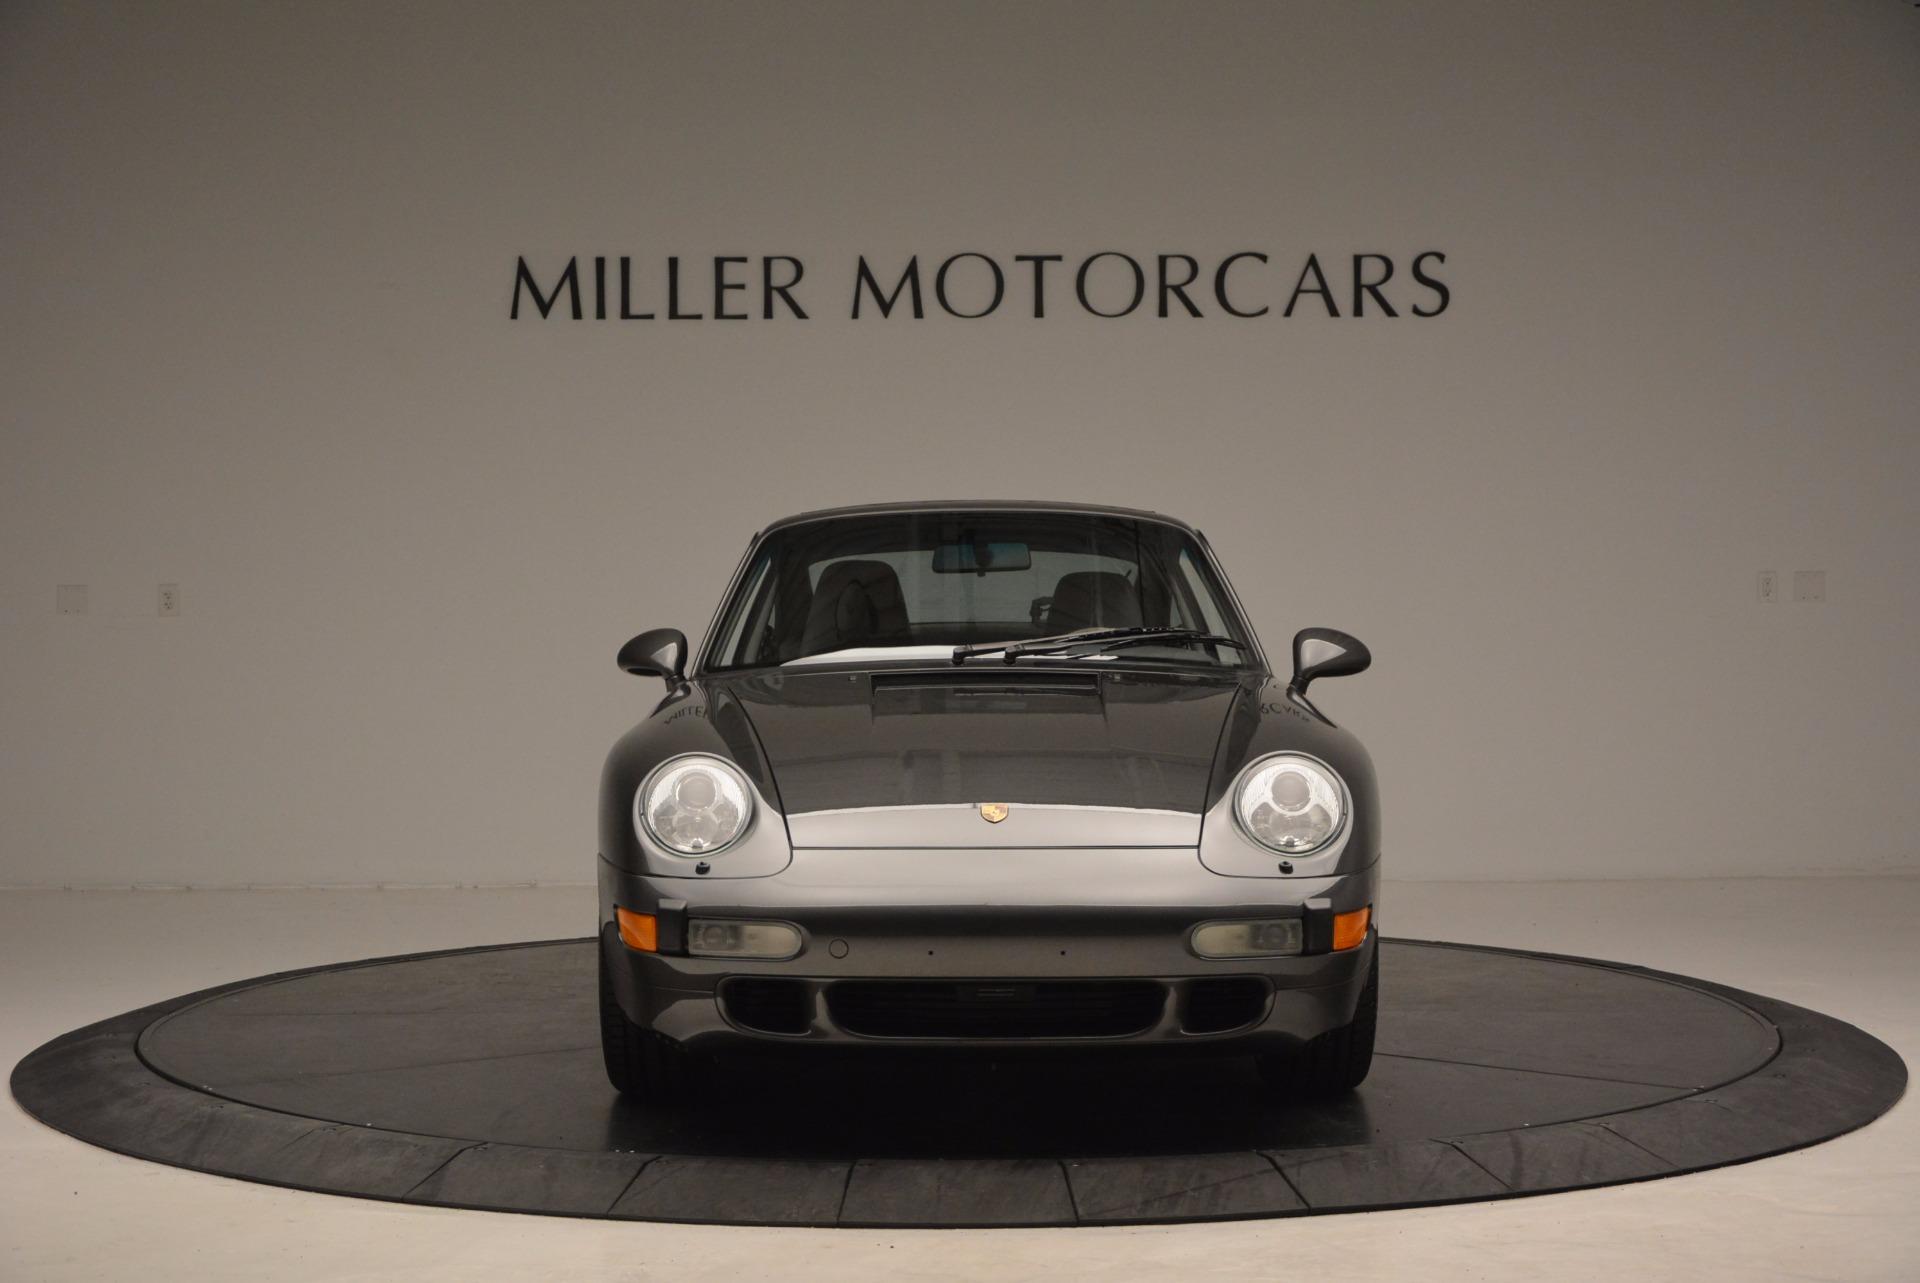 Used 1996 Porsche 911 Turbo For Sale In Greenwich, CT 1058_p12